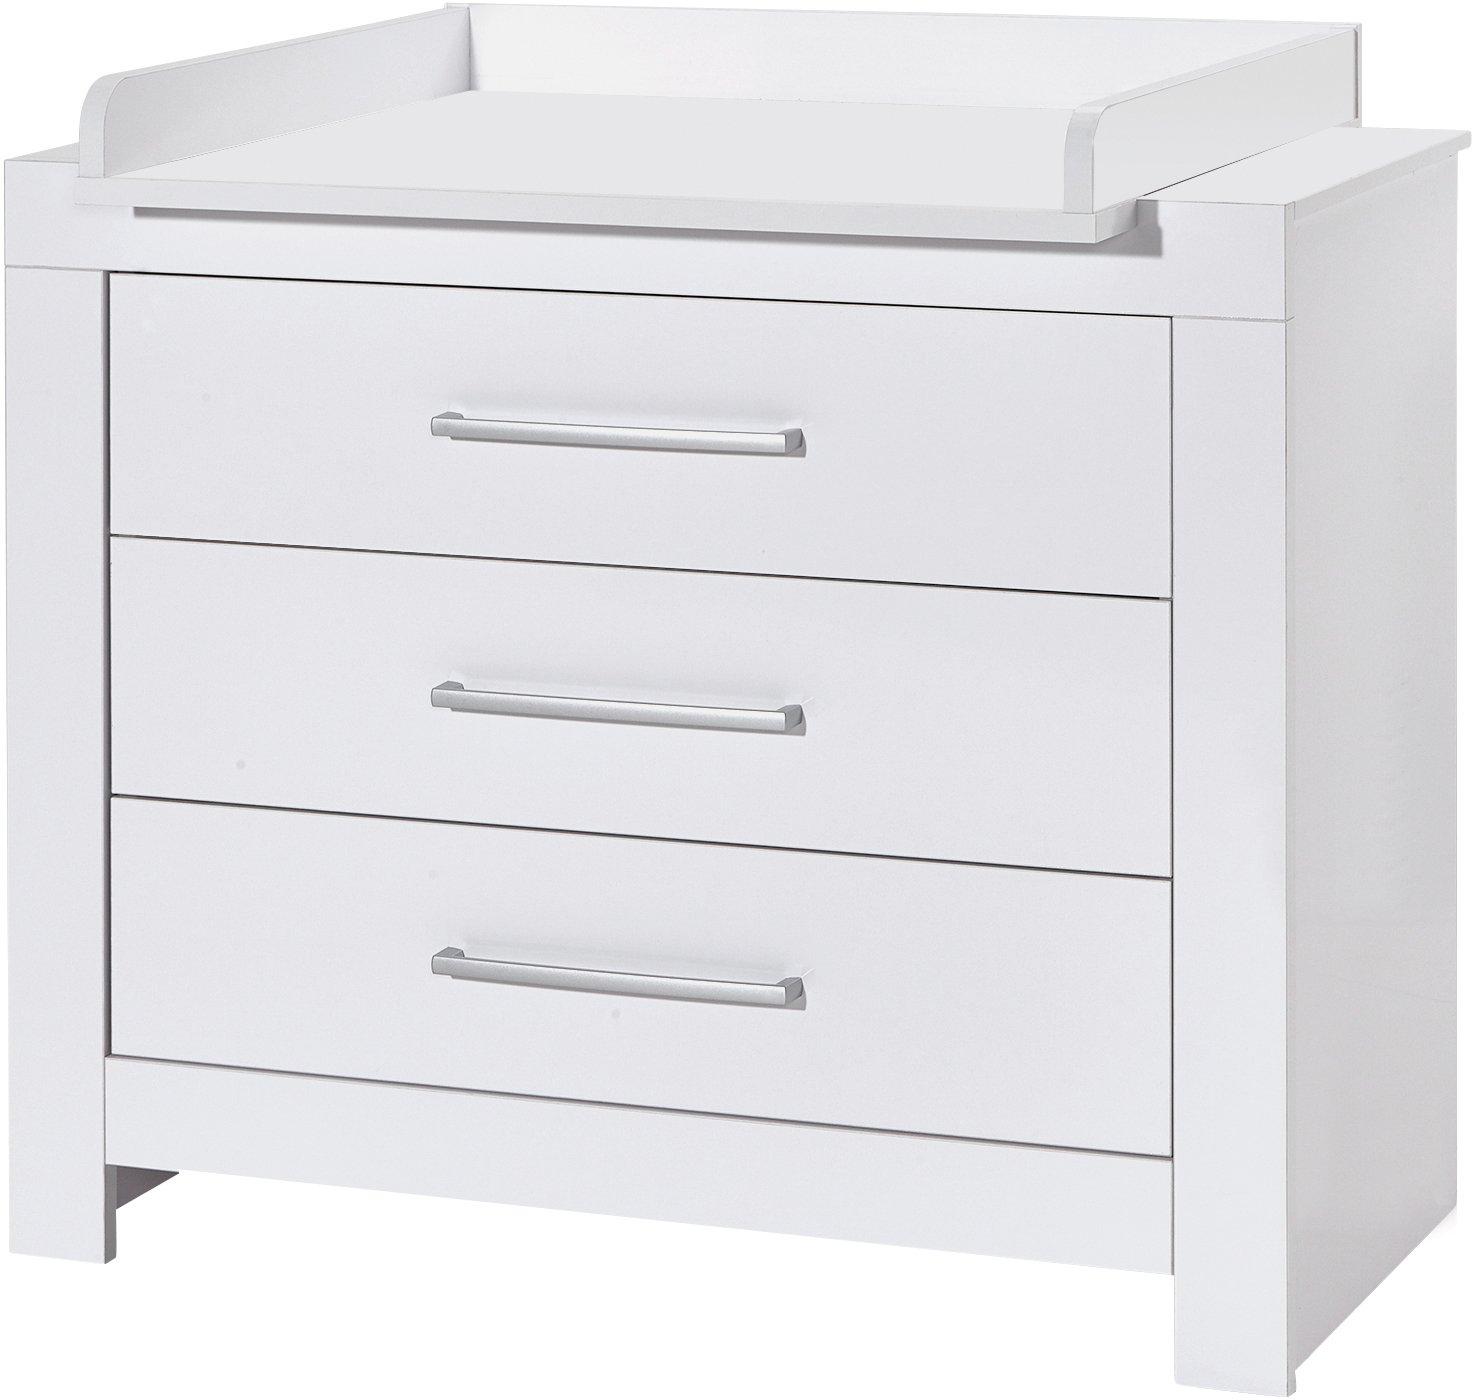 Schardt commode Nordic White Made in Germany - gratis ruilen op otto.nl